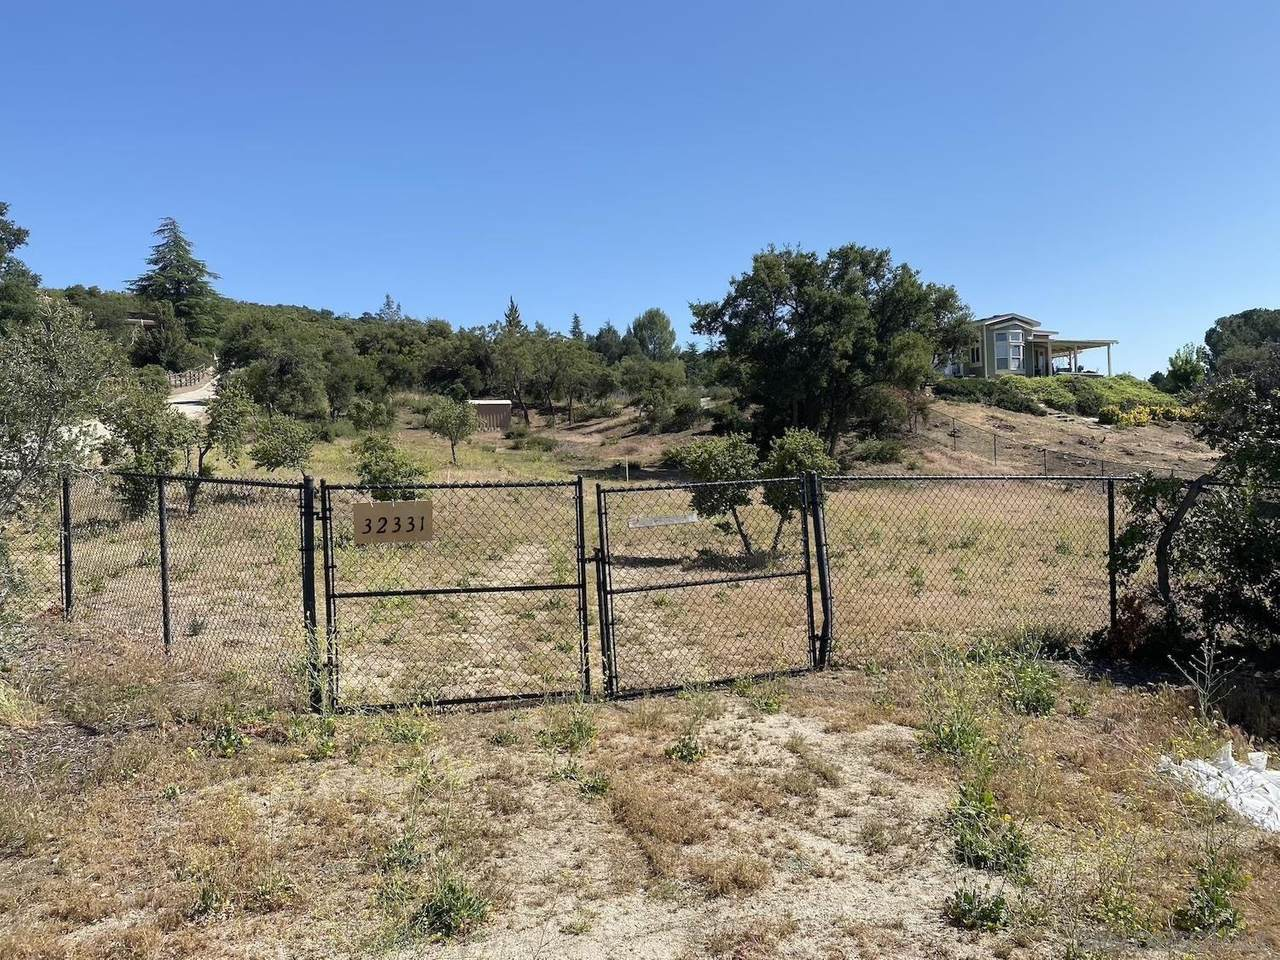 32331 Camino San Ignacio - Photo 1